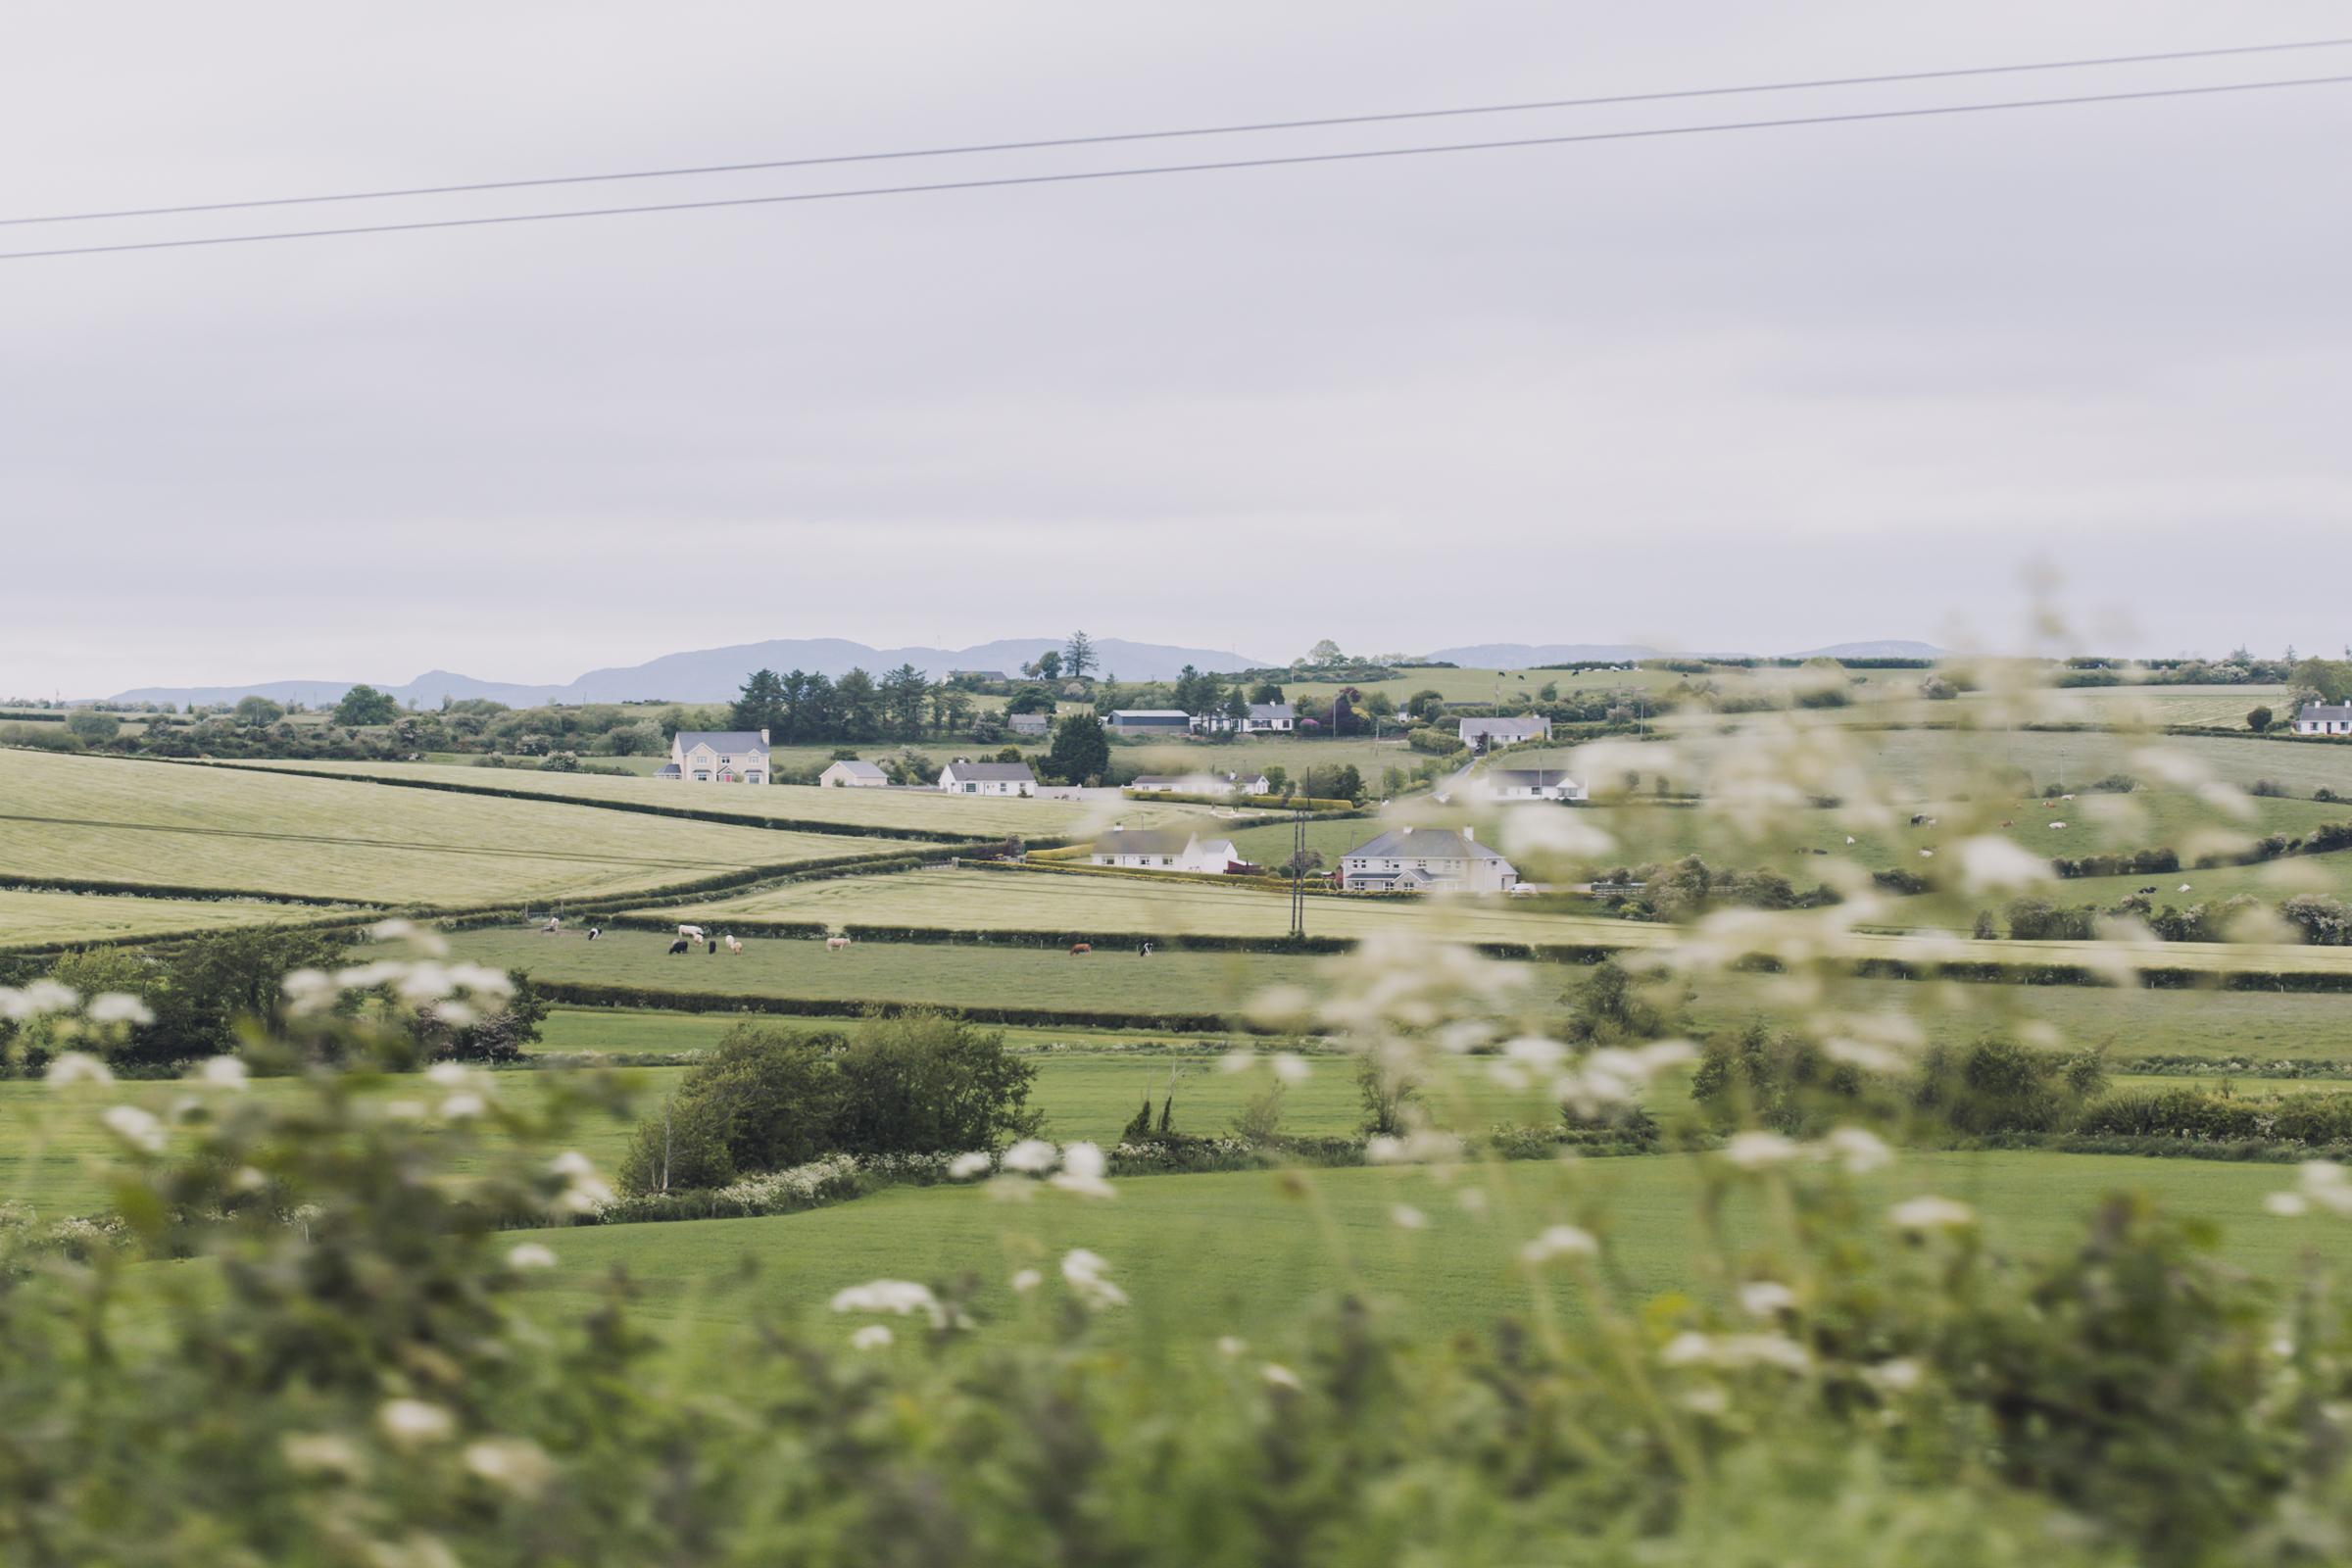 20150616-067-Ireland_Travel_Editorial.jpg